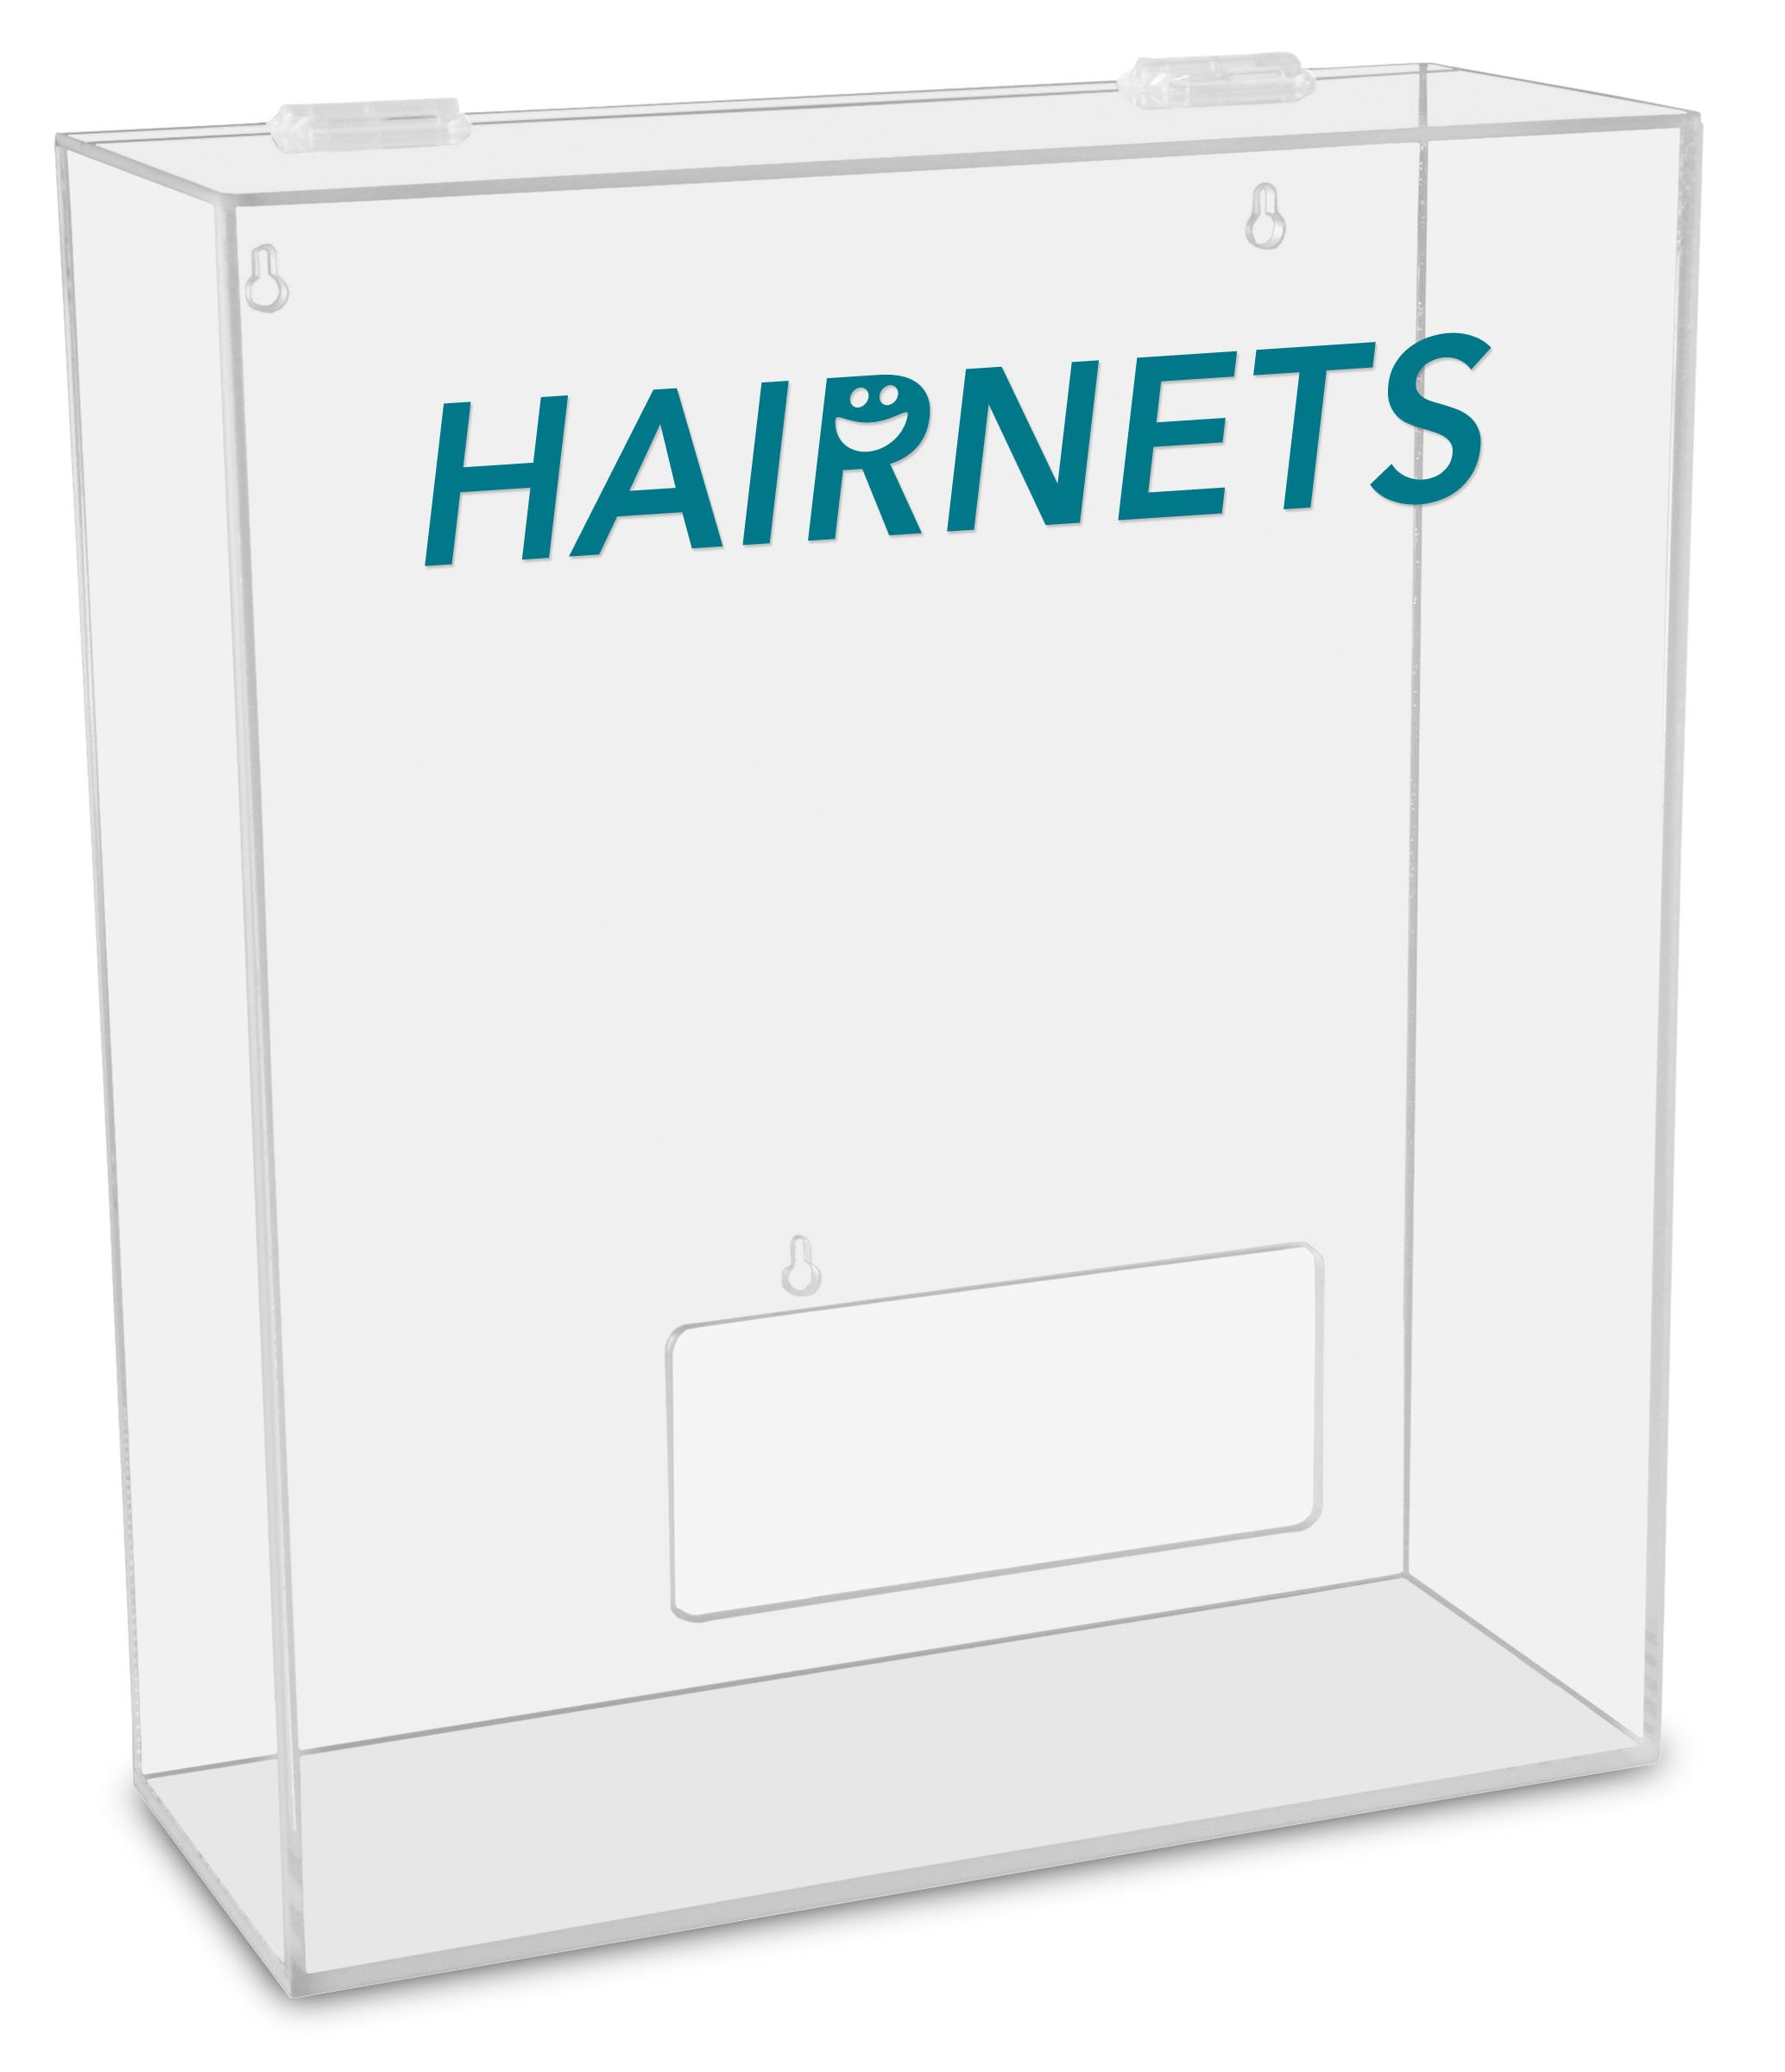 TrippNT 51309 Hairnets Labeled Medium Apparel Dispenser, 15'' Width x 18'' Height x 6'' Depth